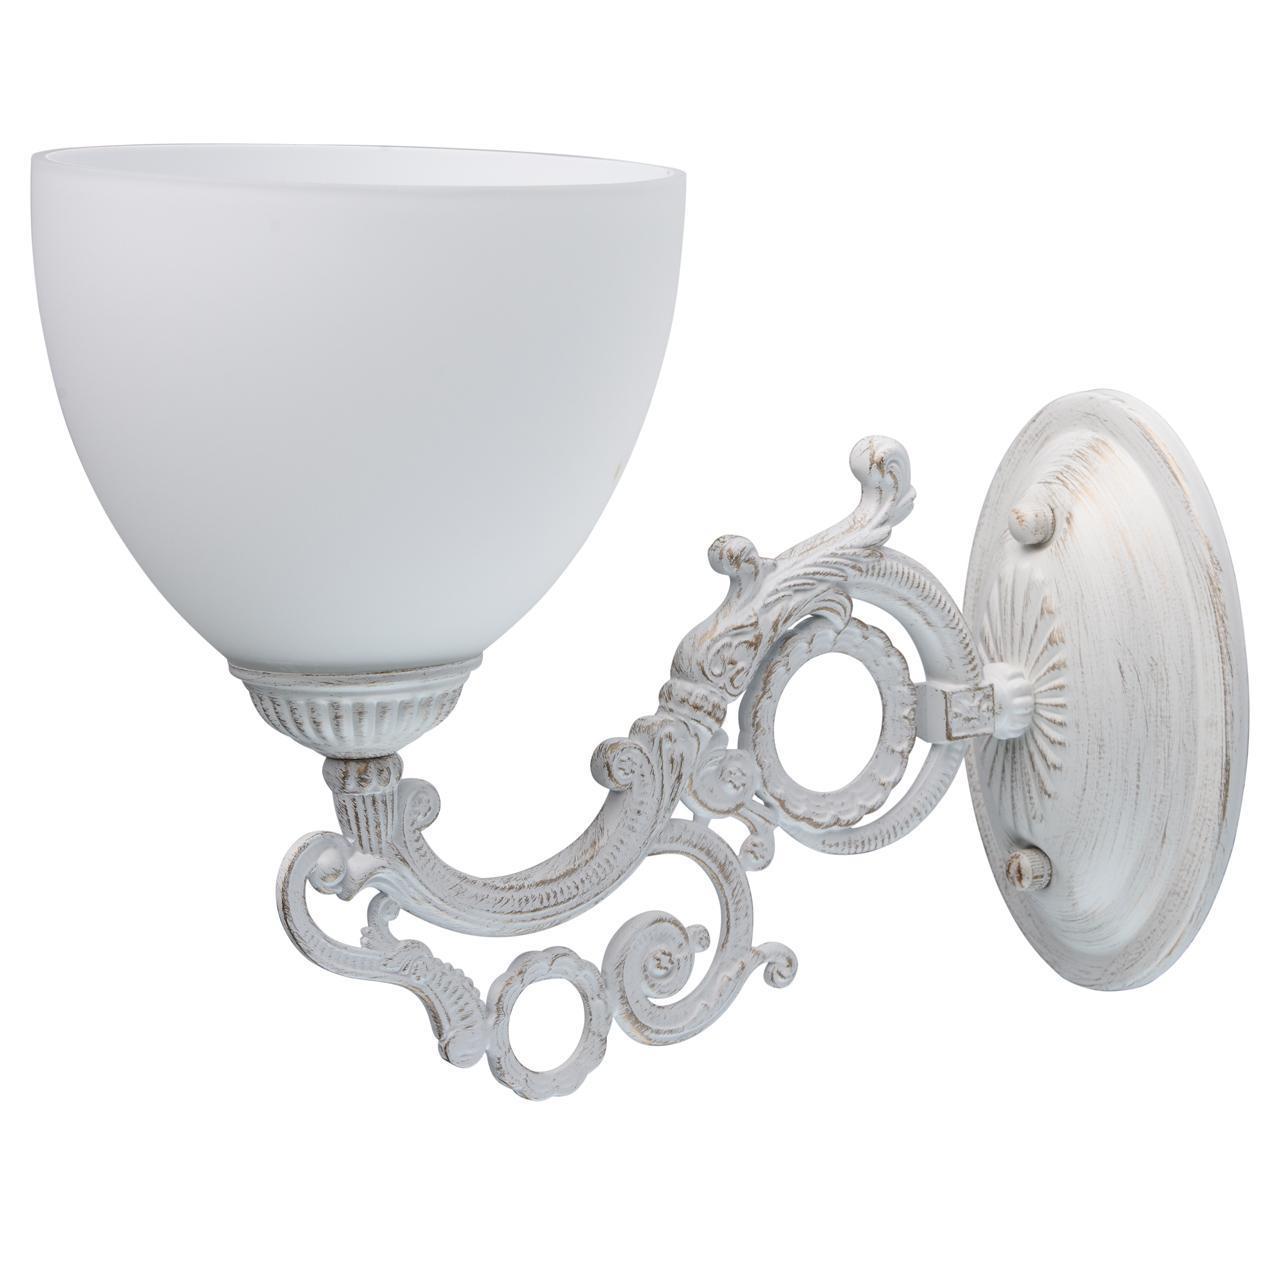 Бра MW-Light Ариадна 450026501 mw light бра mw light ариадна 450022901